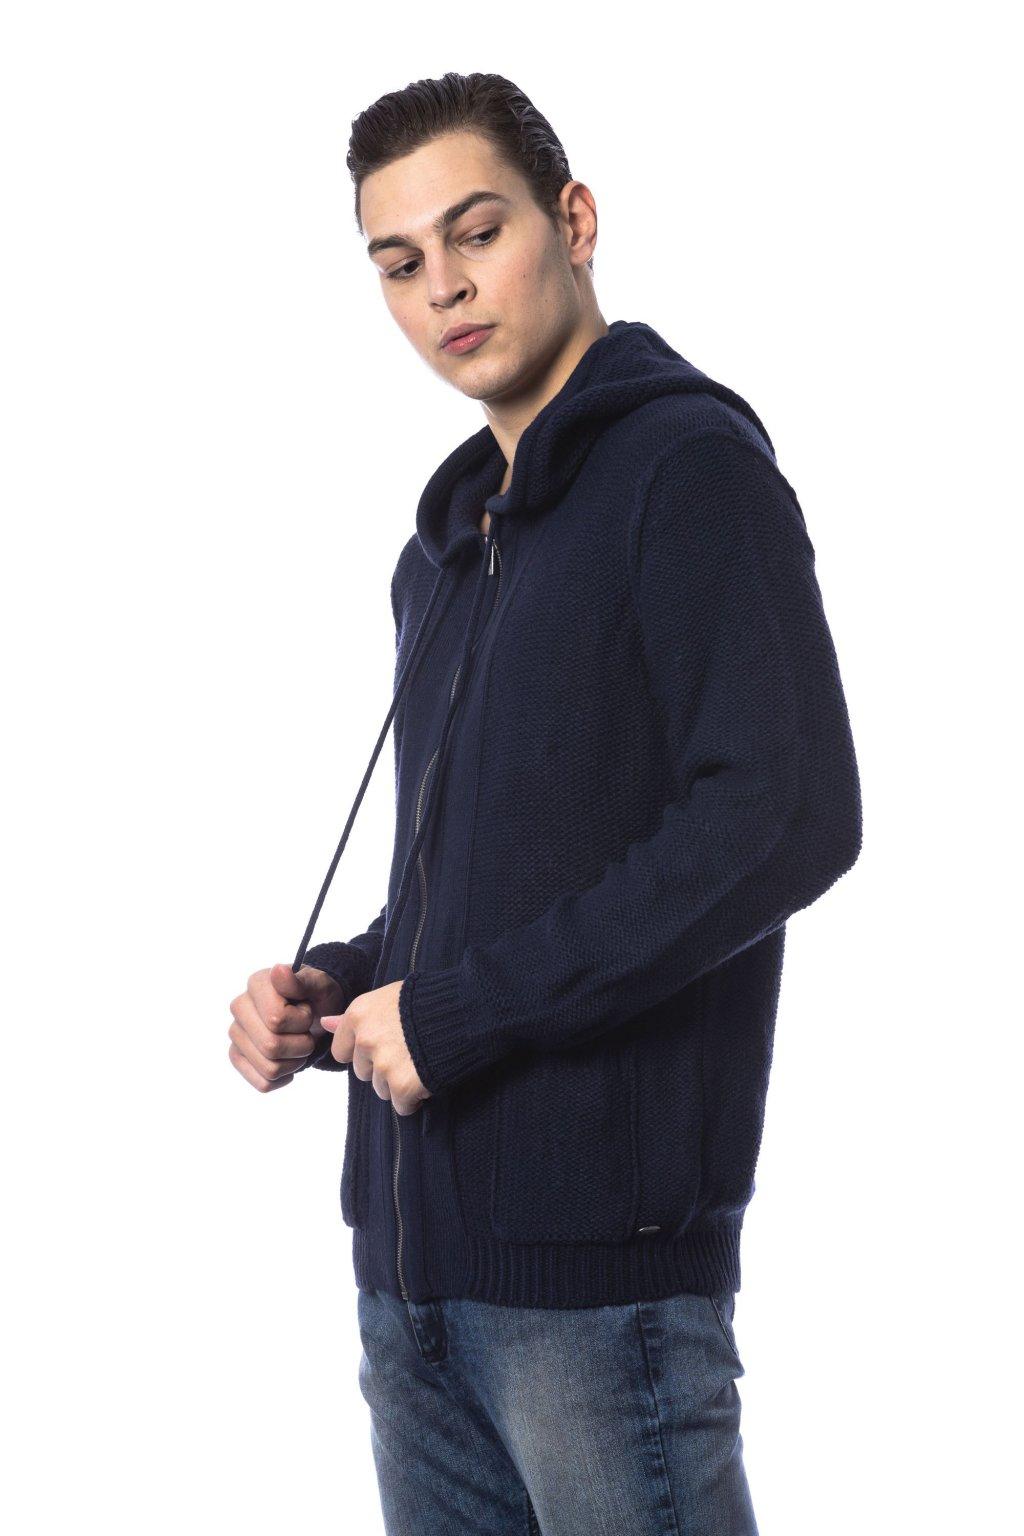 znackova panska mikina s kapuci Gaudi Jeans tmave modra (3)